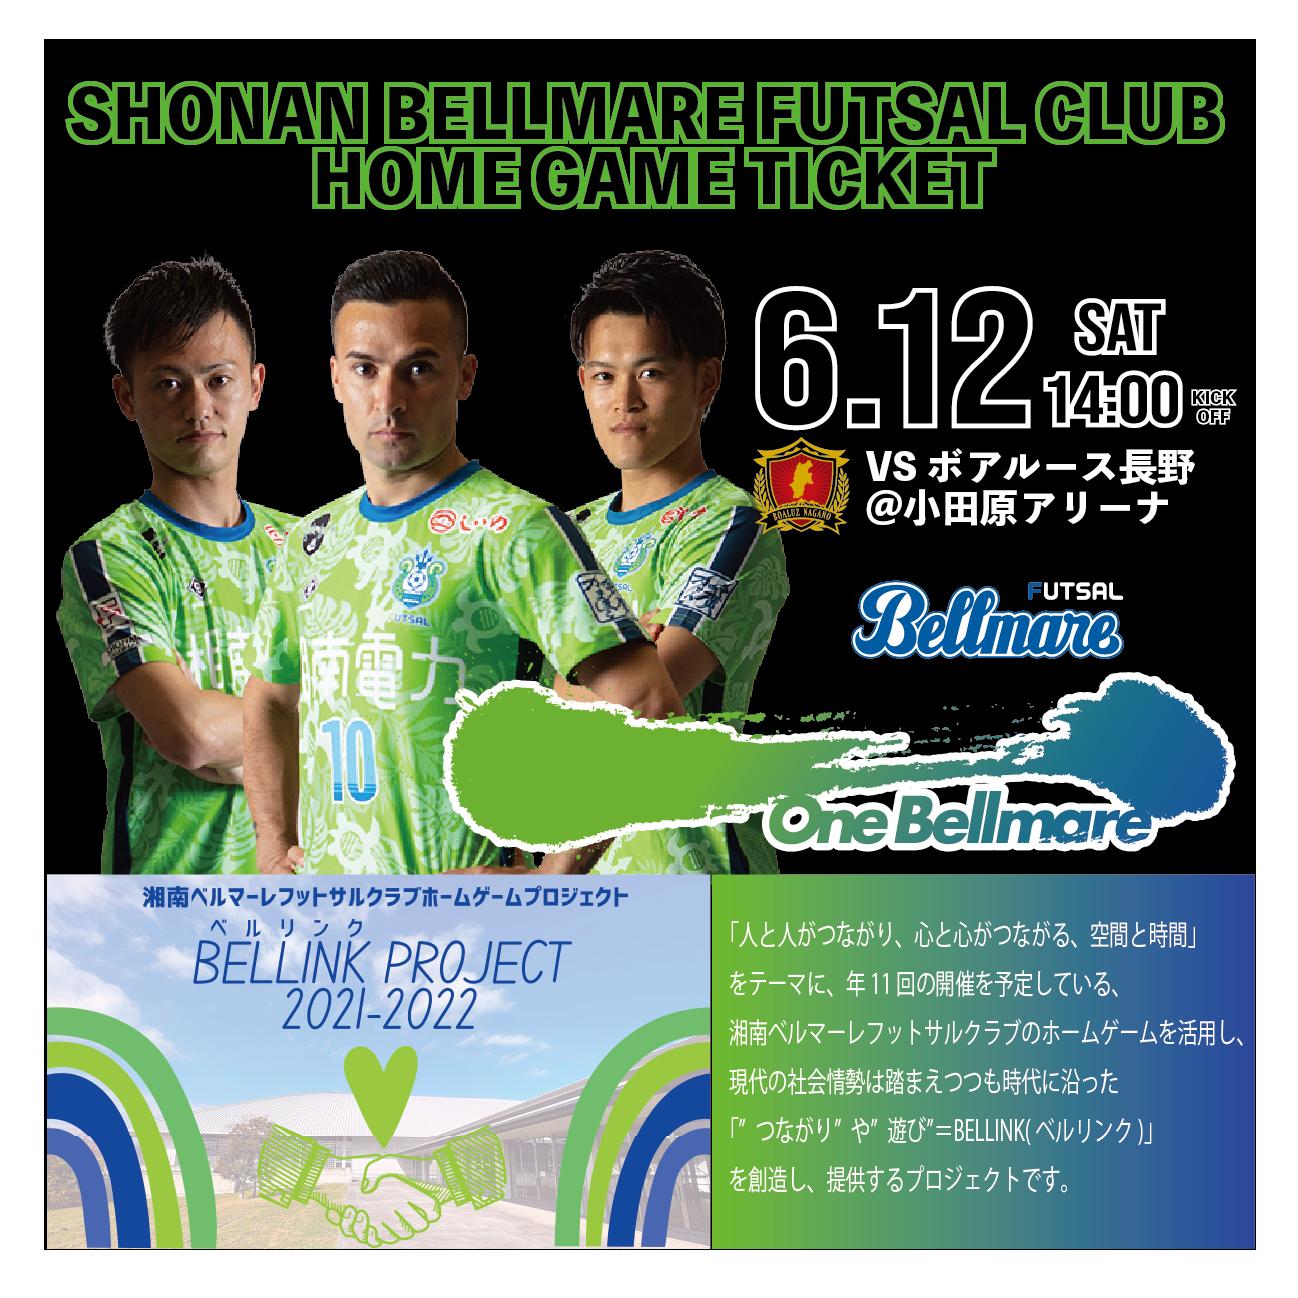 Fリーグ2021-2022 Division1 湘南ベルマーレ vs ボアルース長野